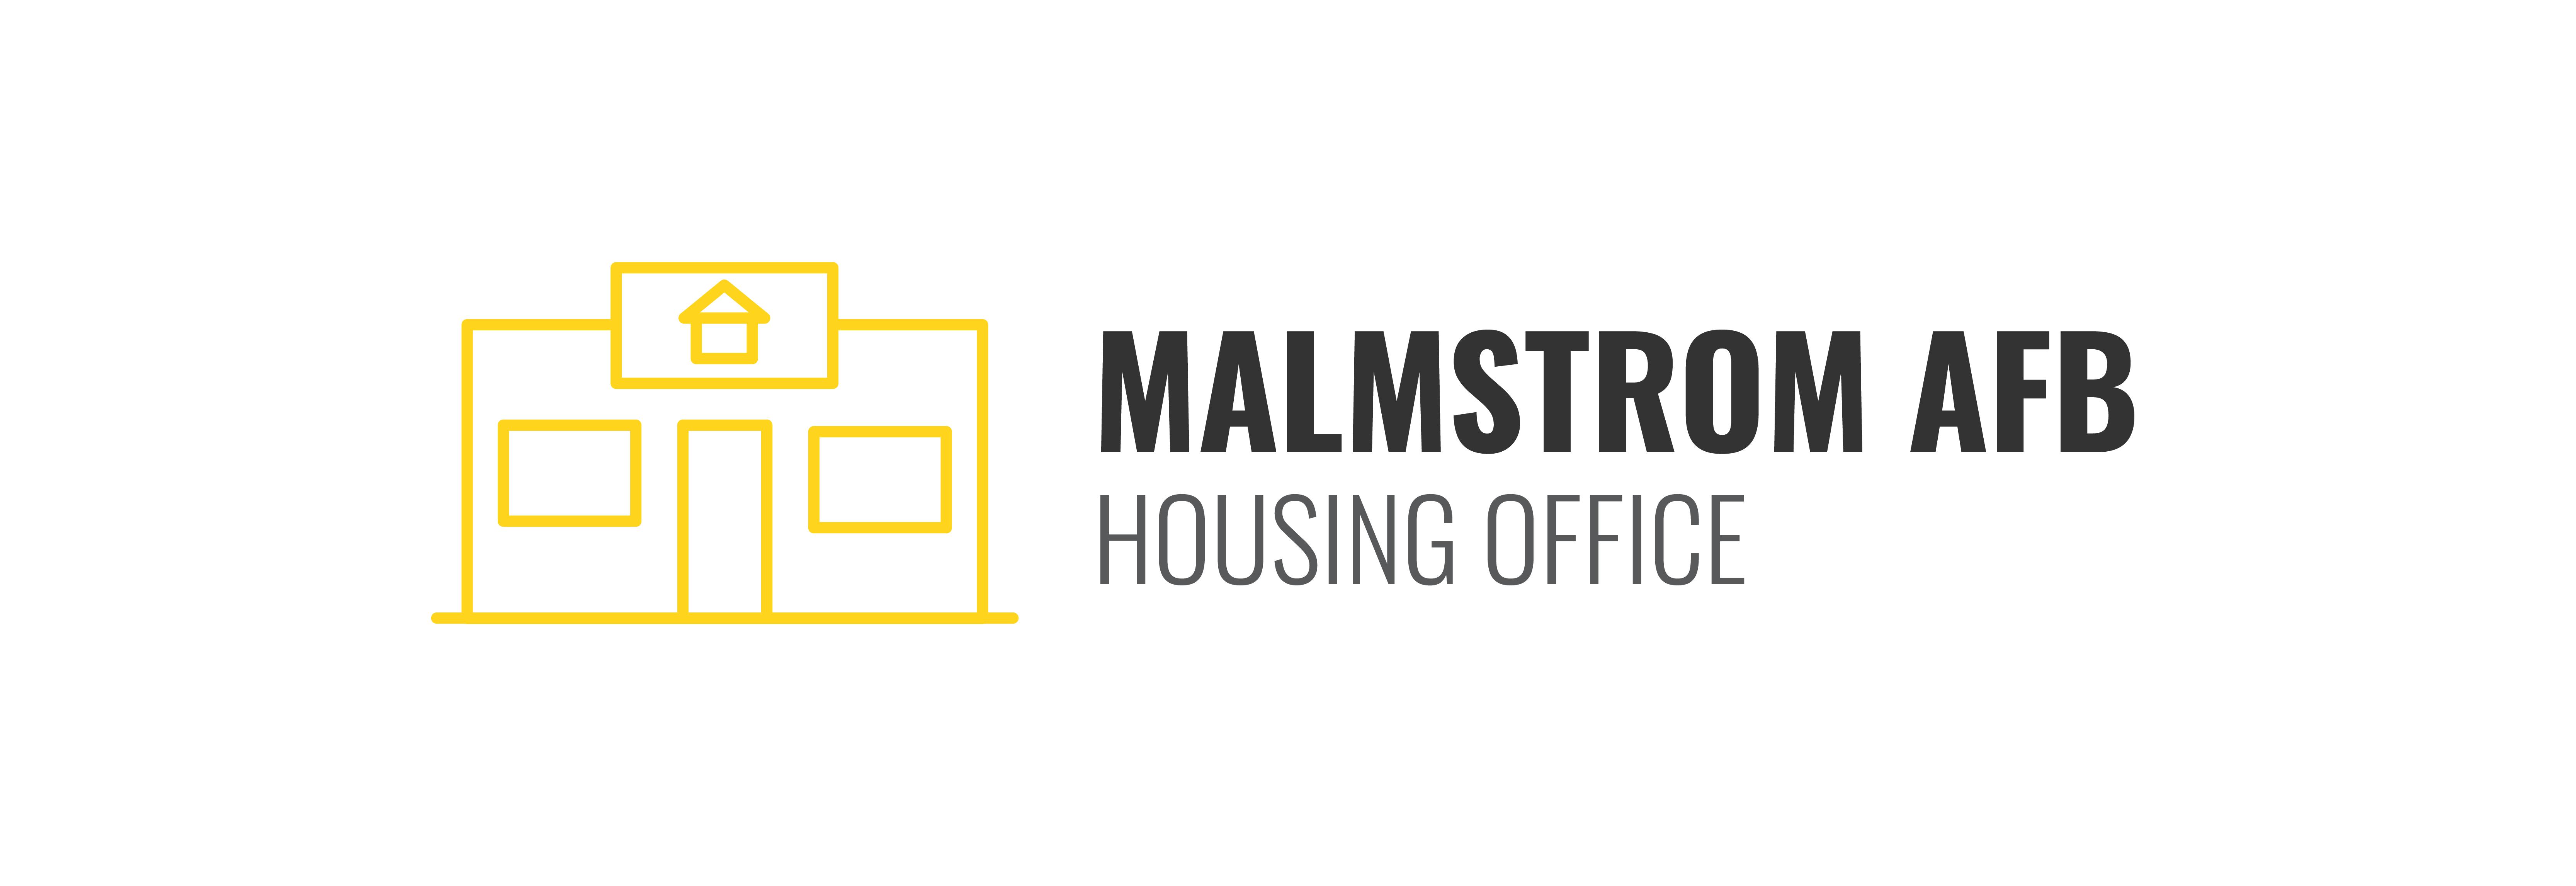 Malmstrom AFB Housing Office